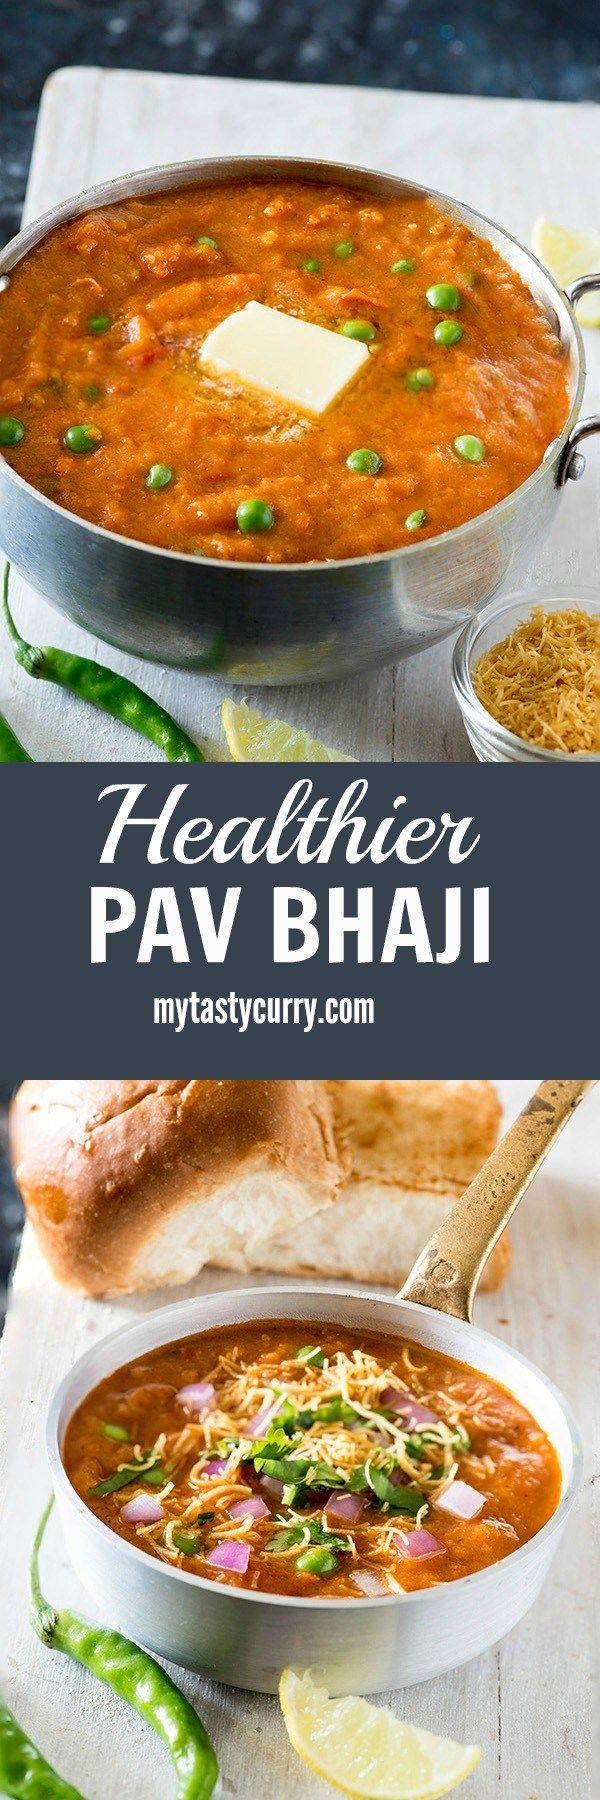 Pav bhaji healthier recipe of mumbai street food pav bhaji healthy pav bhaji recipe in this recipe this mumbai street food classic is made healthier forumfinder Images